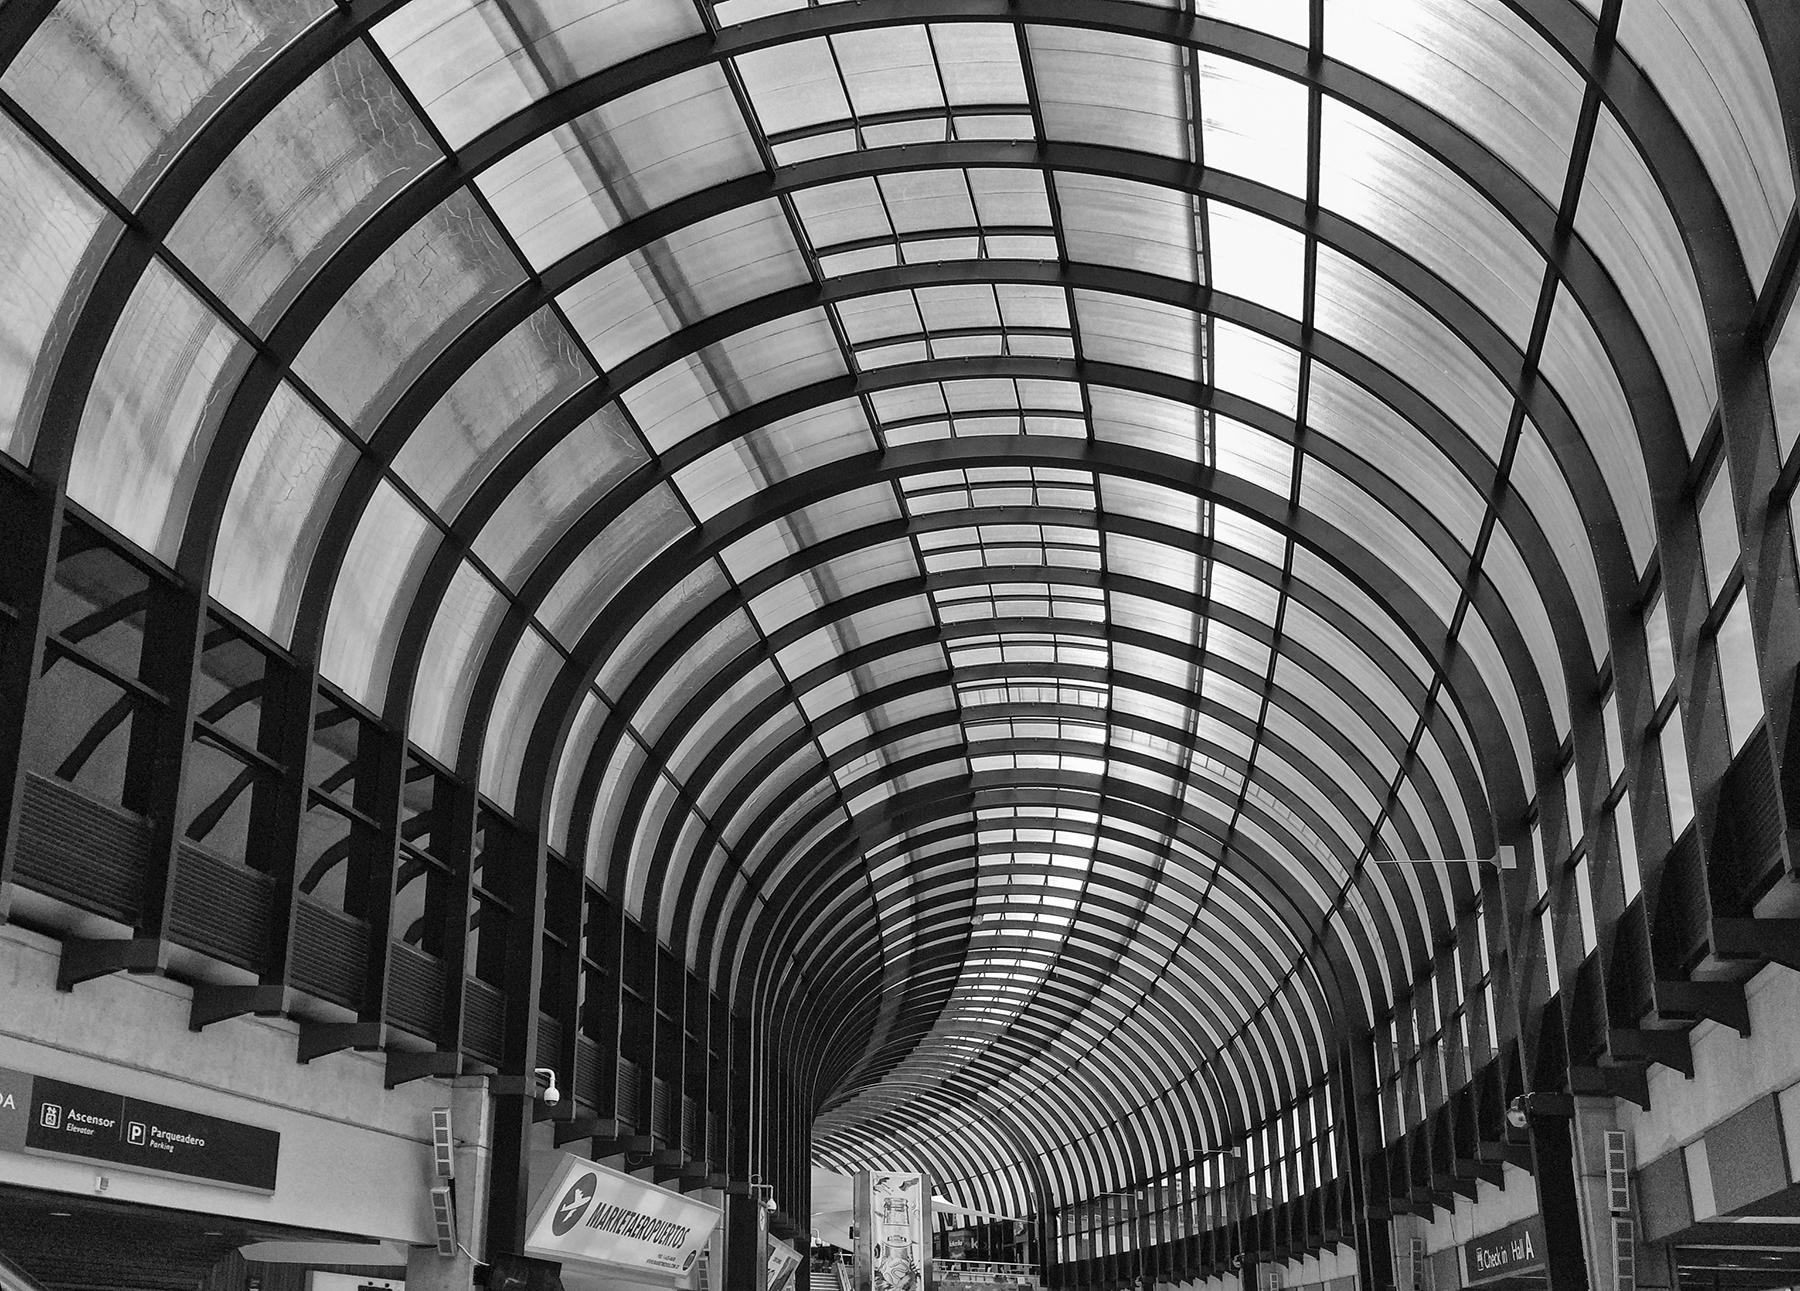 Brian_Jones_Whorl 3 - Medellin Airport.jpg